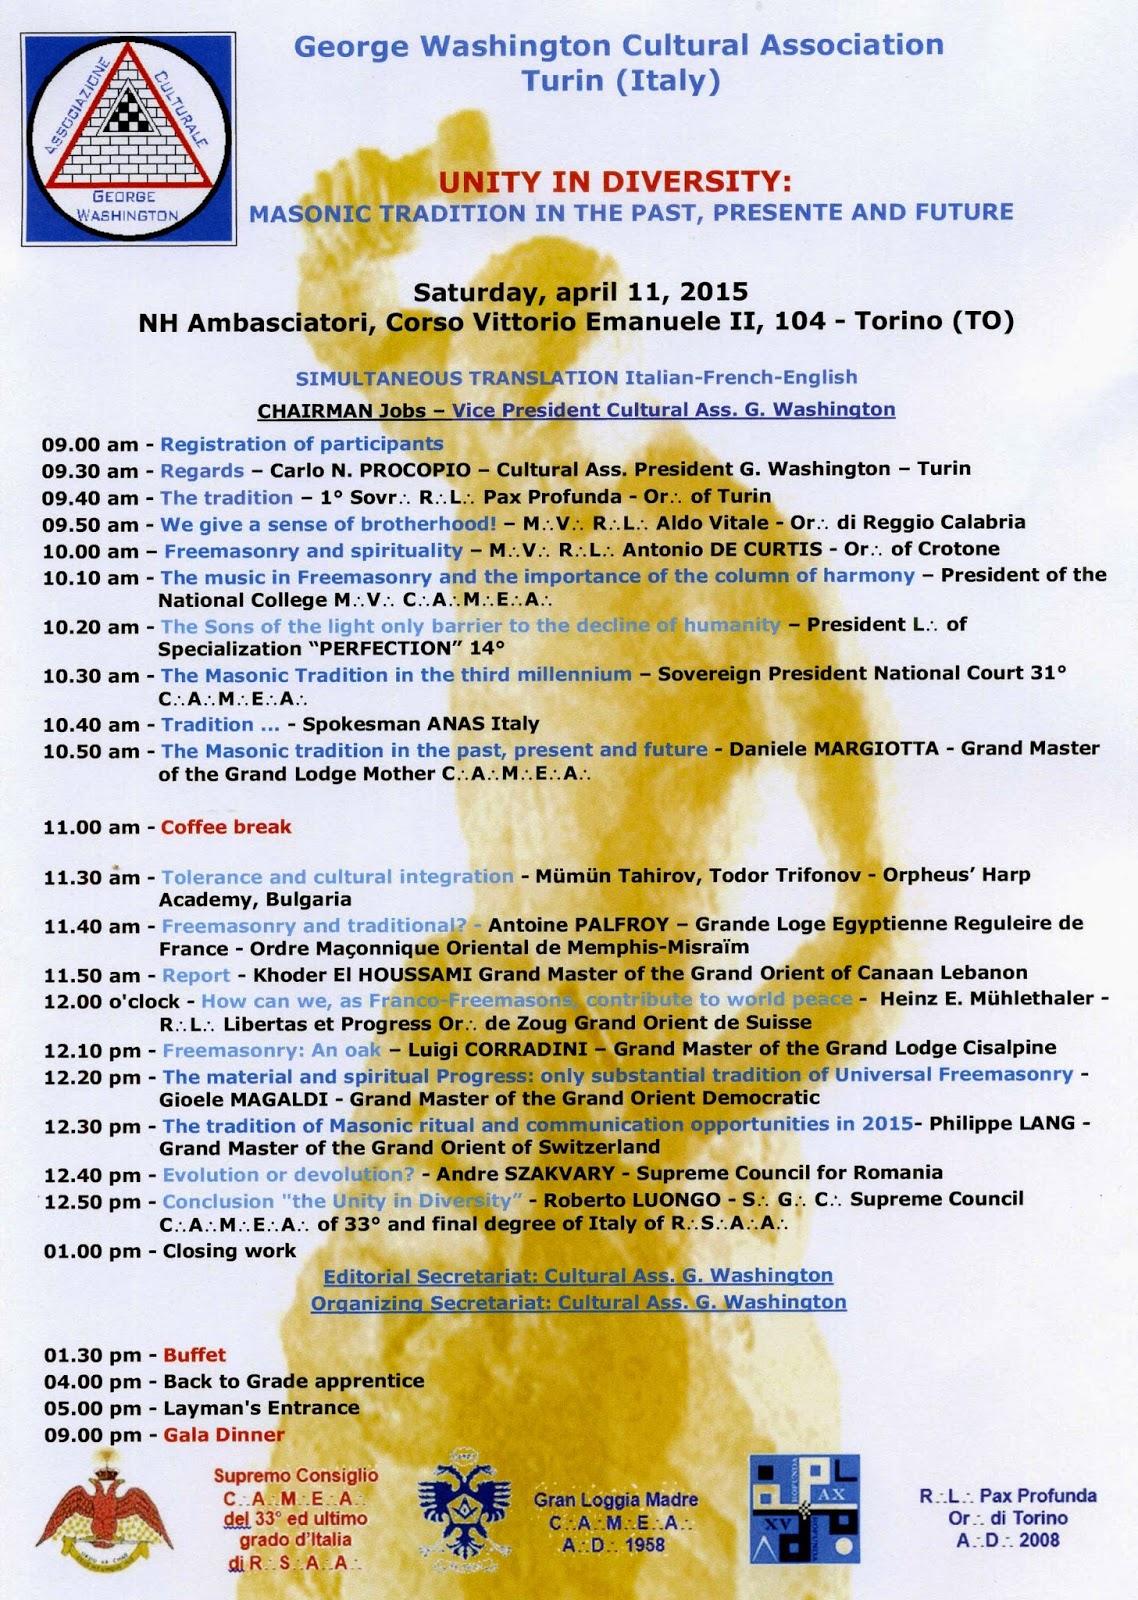 agenzia di stampa massonica italiana meeting of april 11 On importante agenzia di stampa italiana codycross